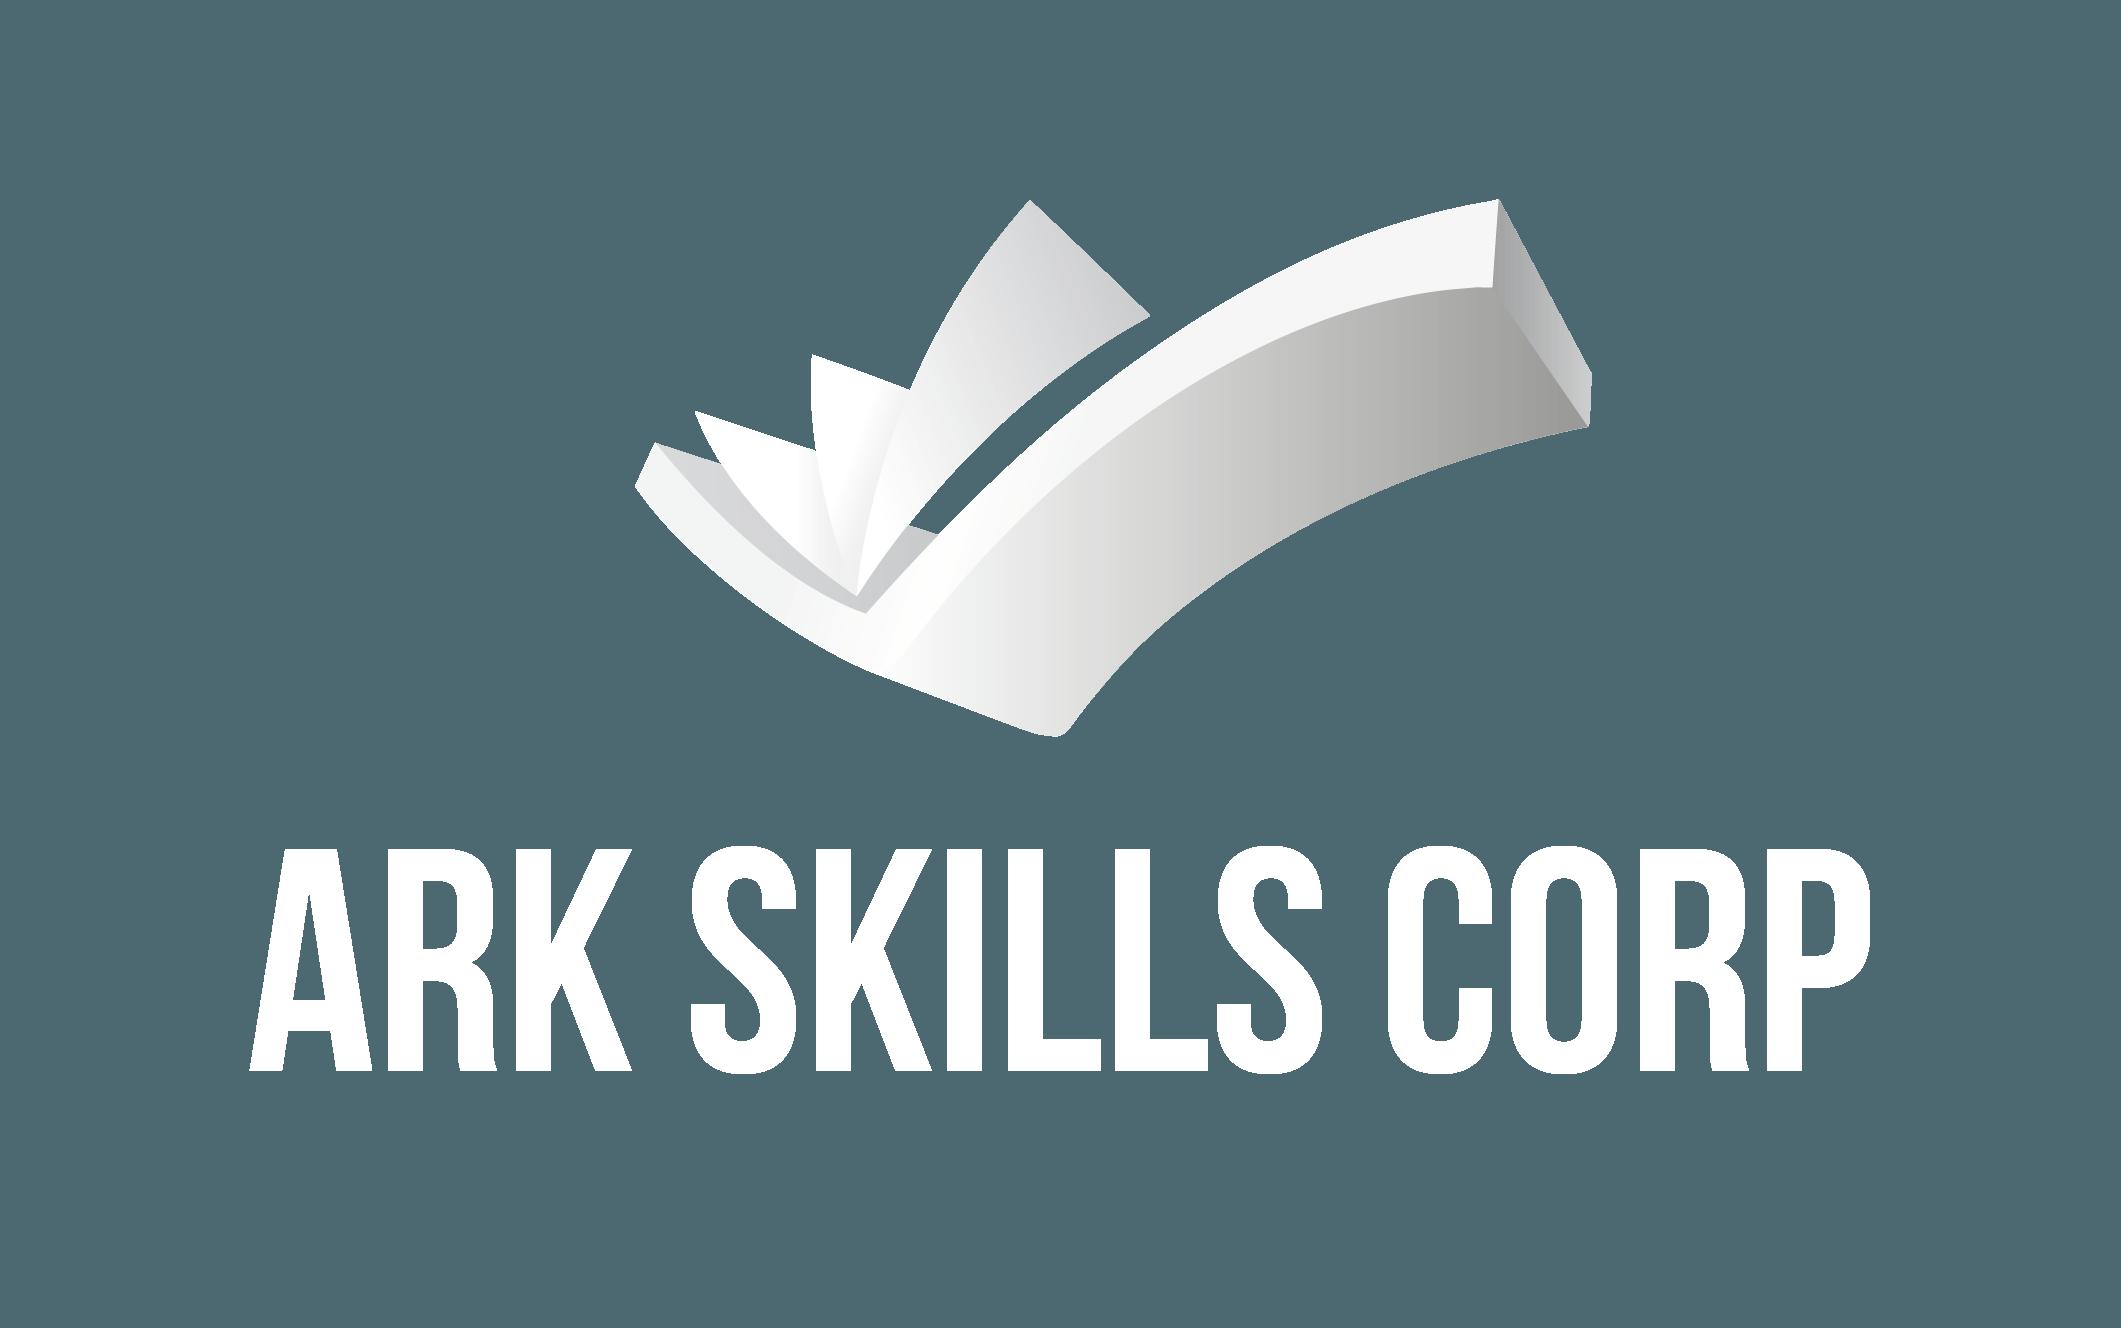 ARK Skills Corporation